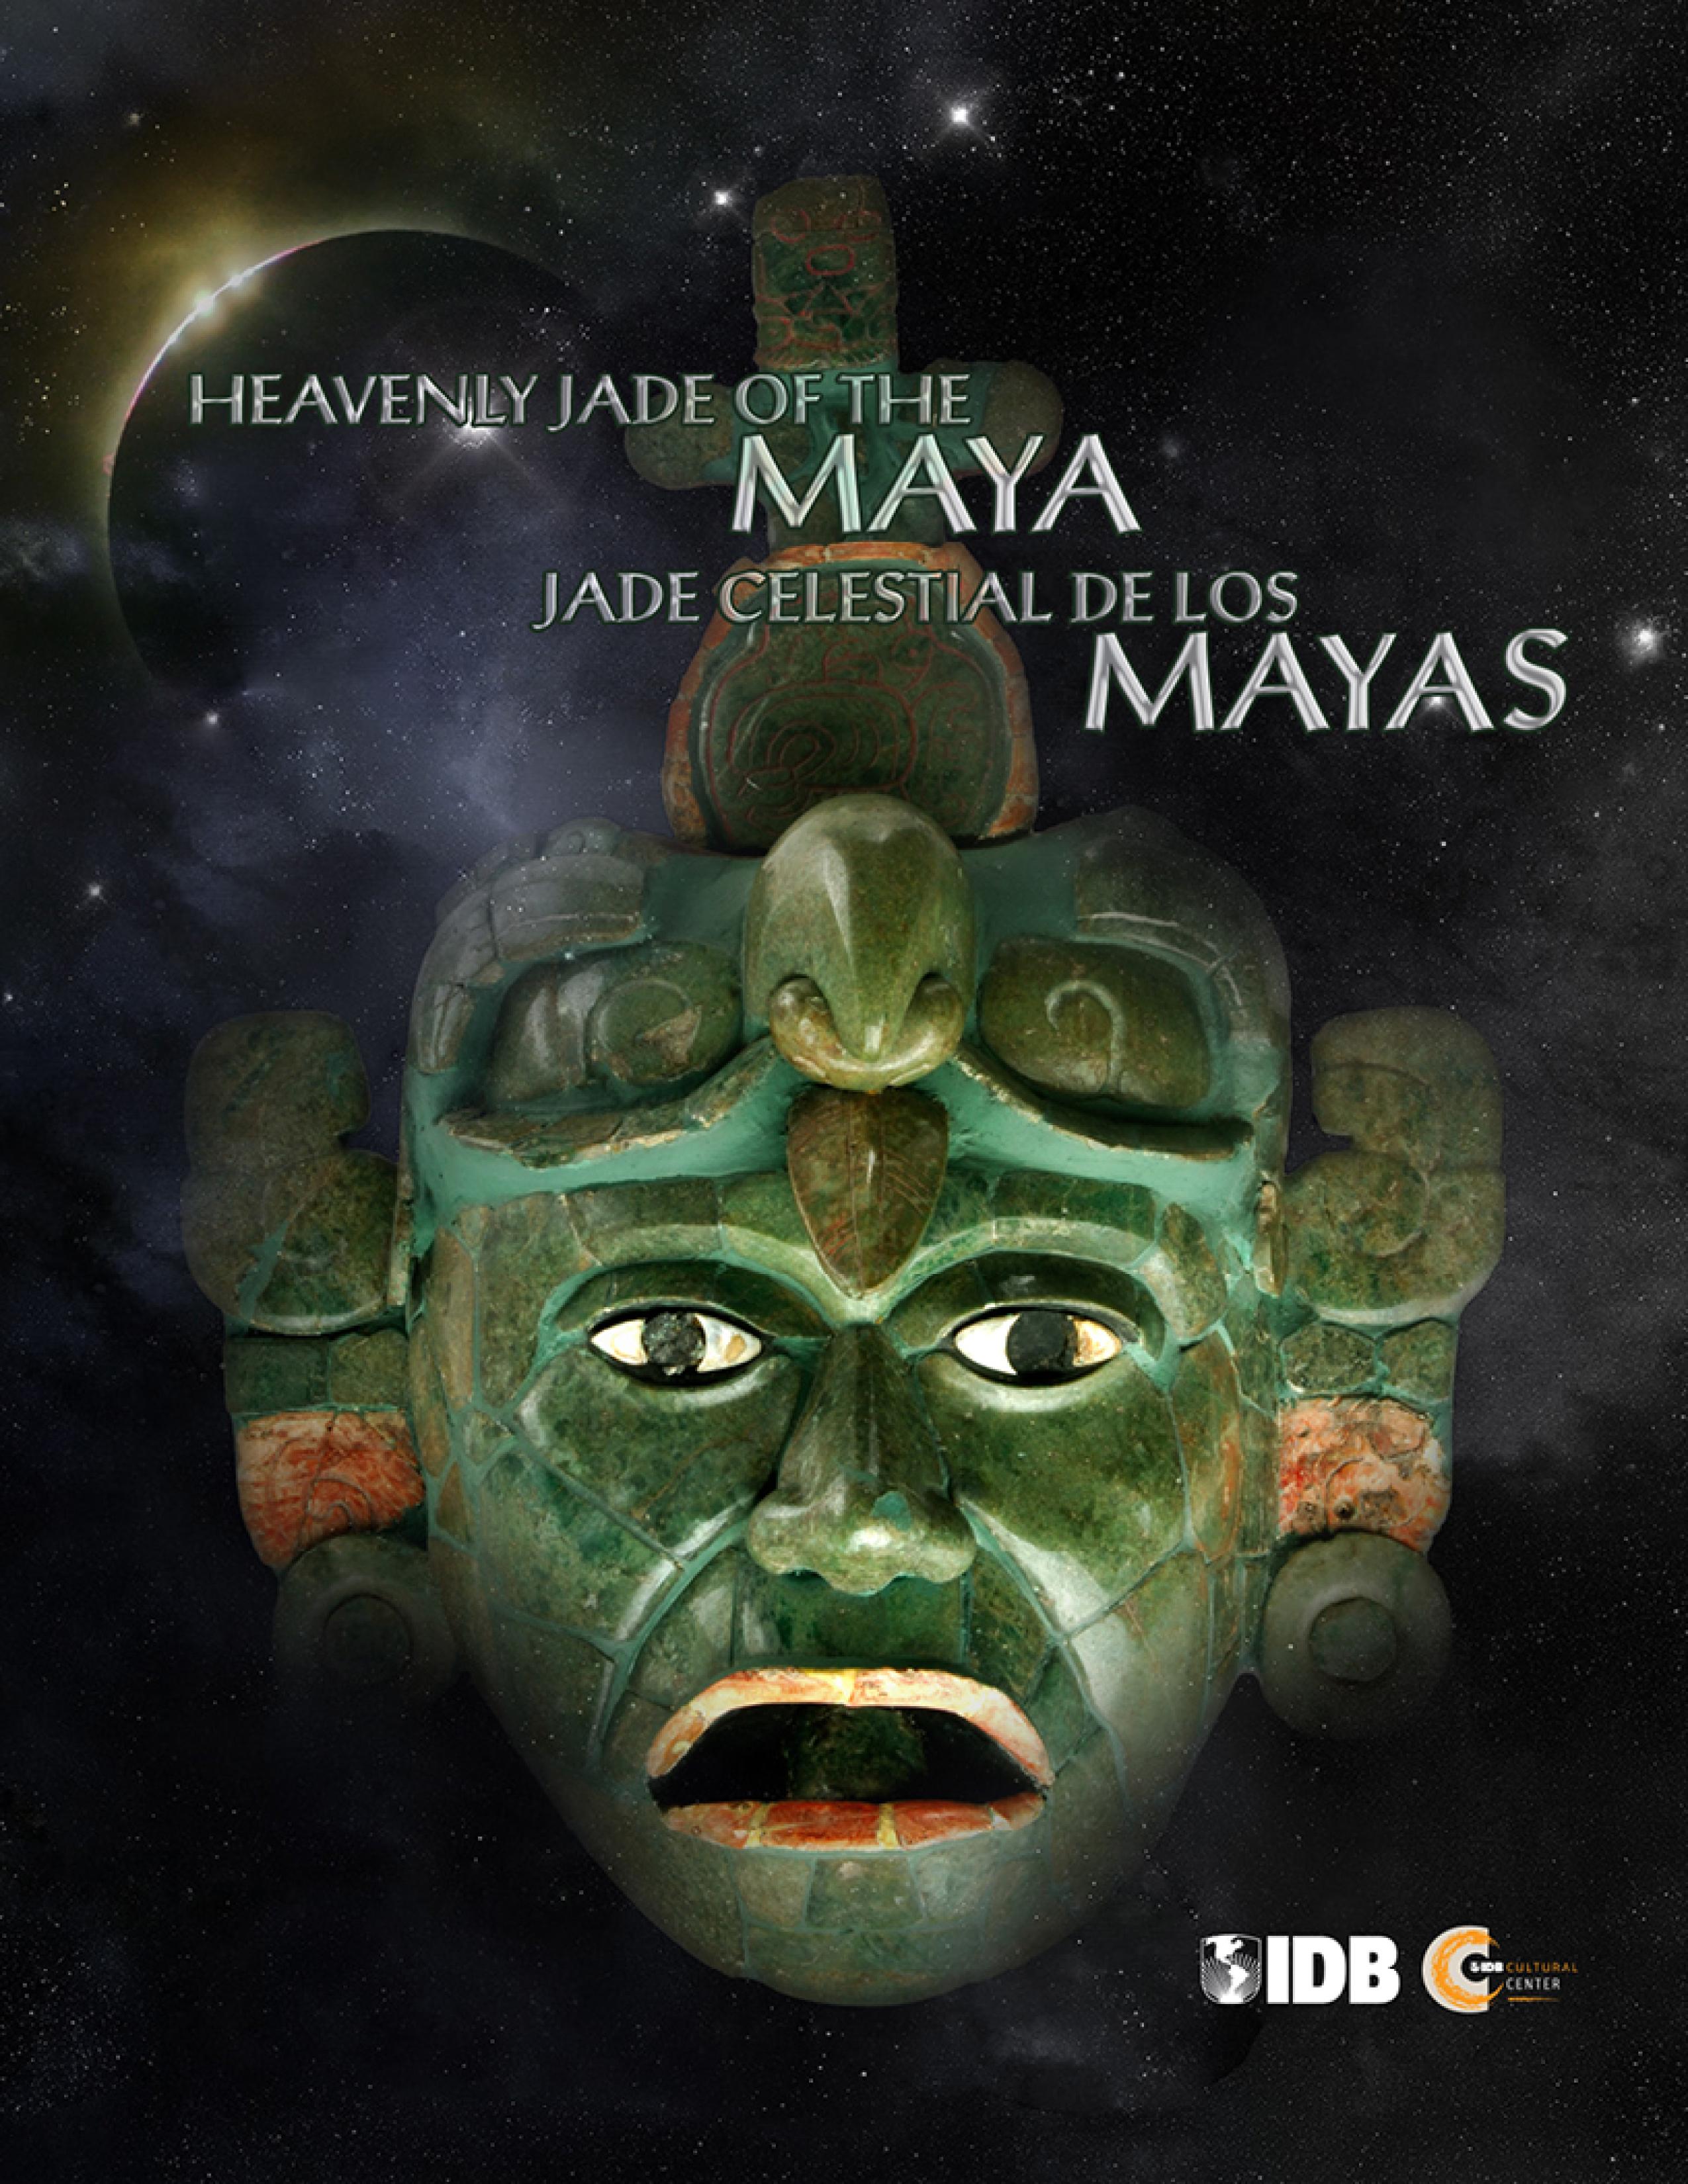 Heavenly Jade of the Maya Poster